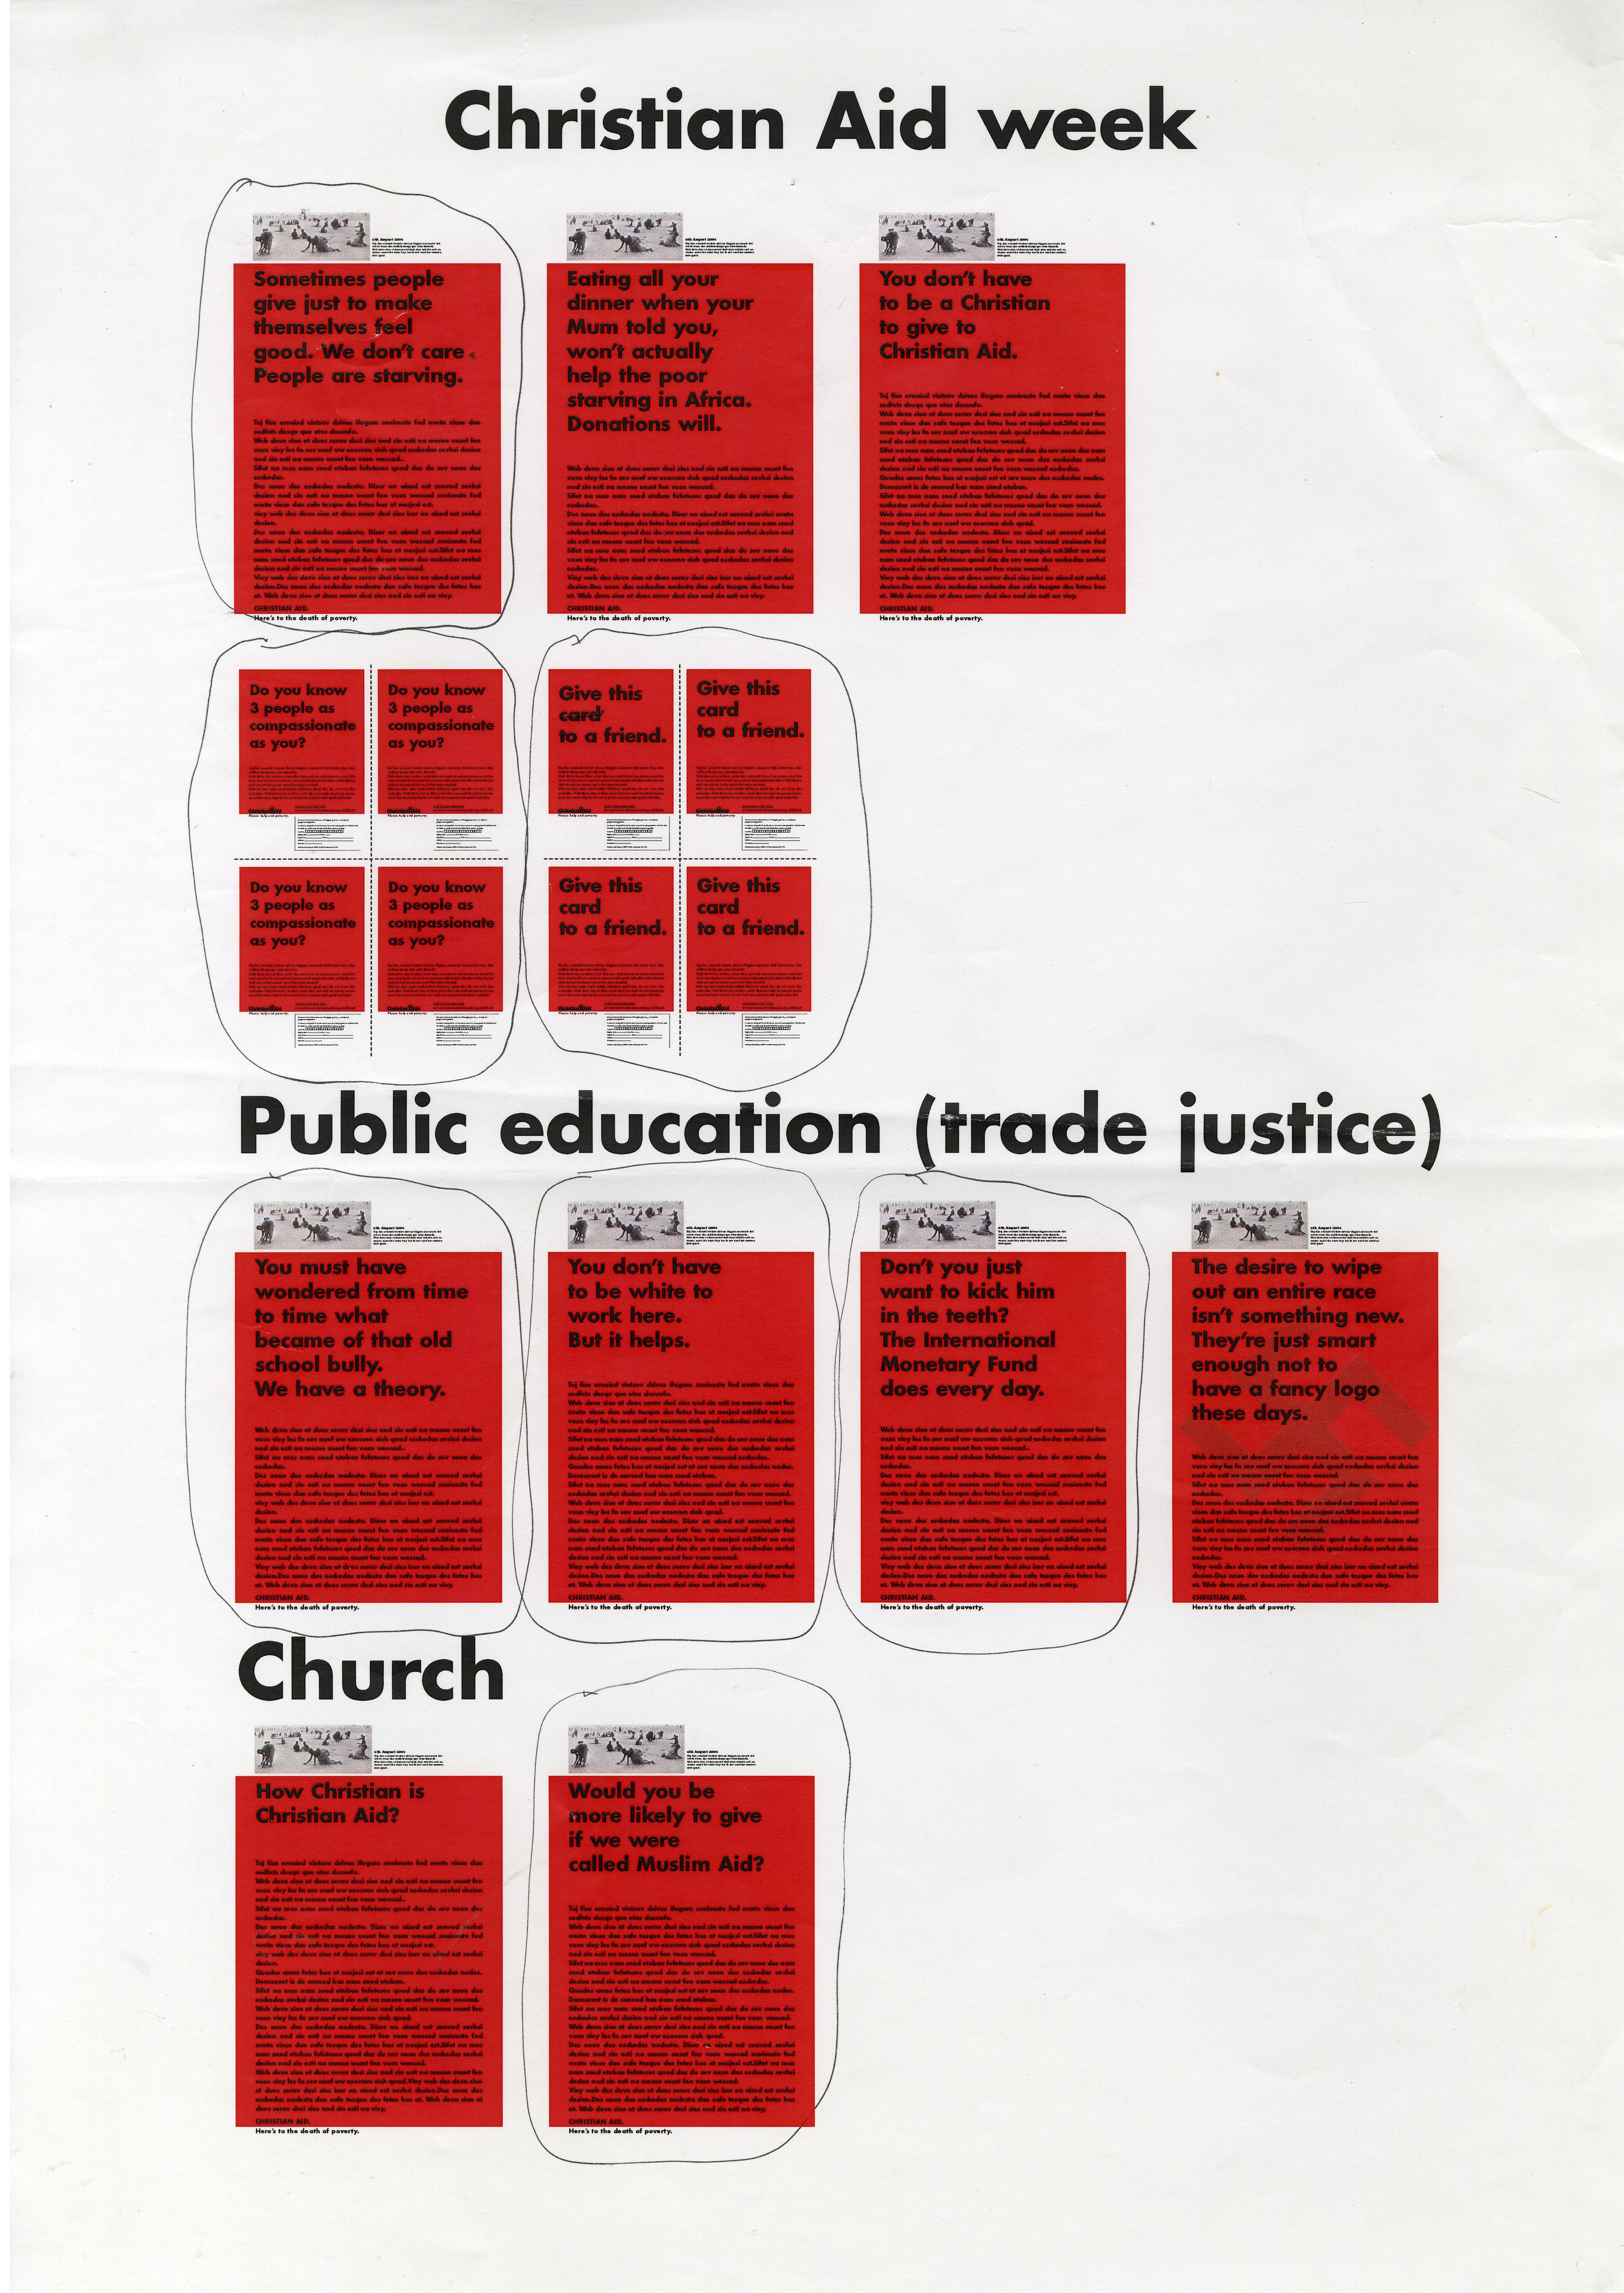 Christian Aid, RED, Sheet of roughs - A, CDD-01.jpg